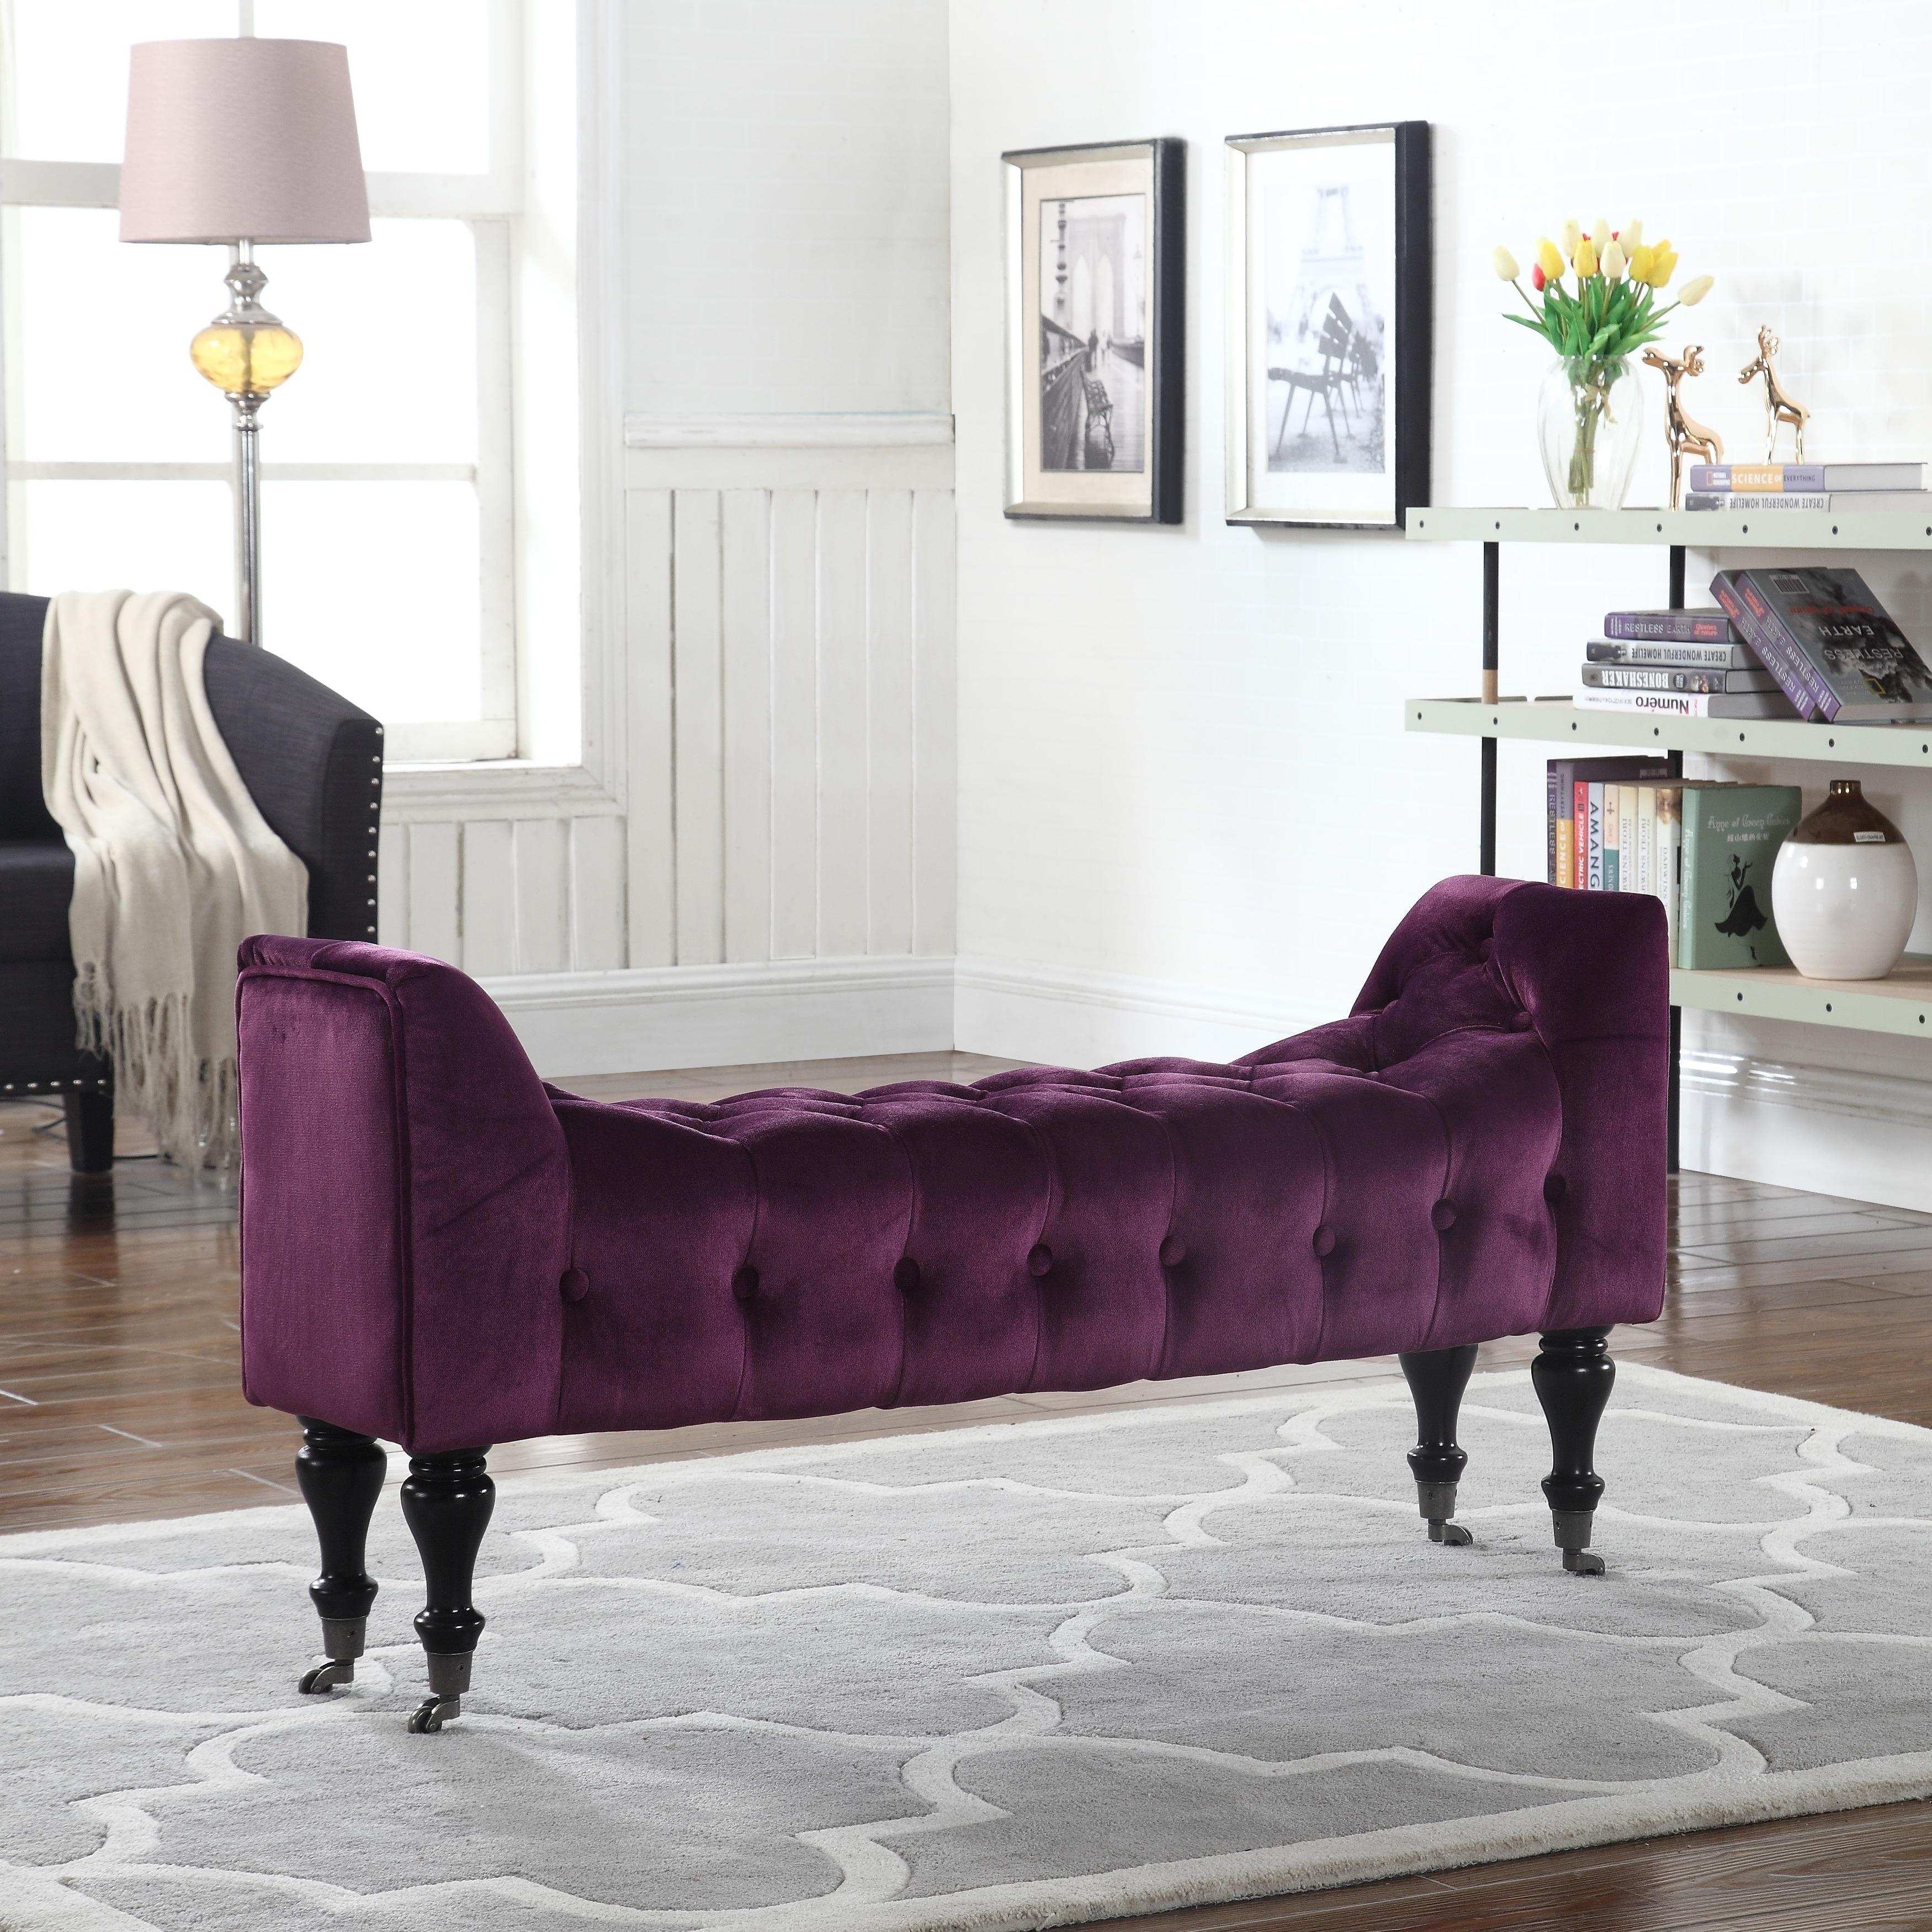 Elegant Velvet Footrest/Footstool/Ottoman with Casters, Tufted ...